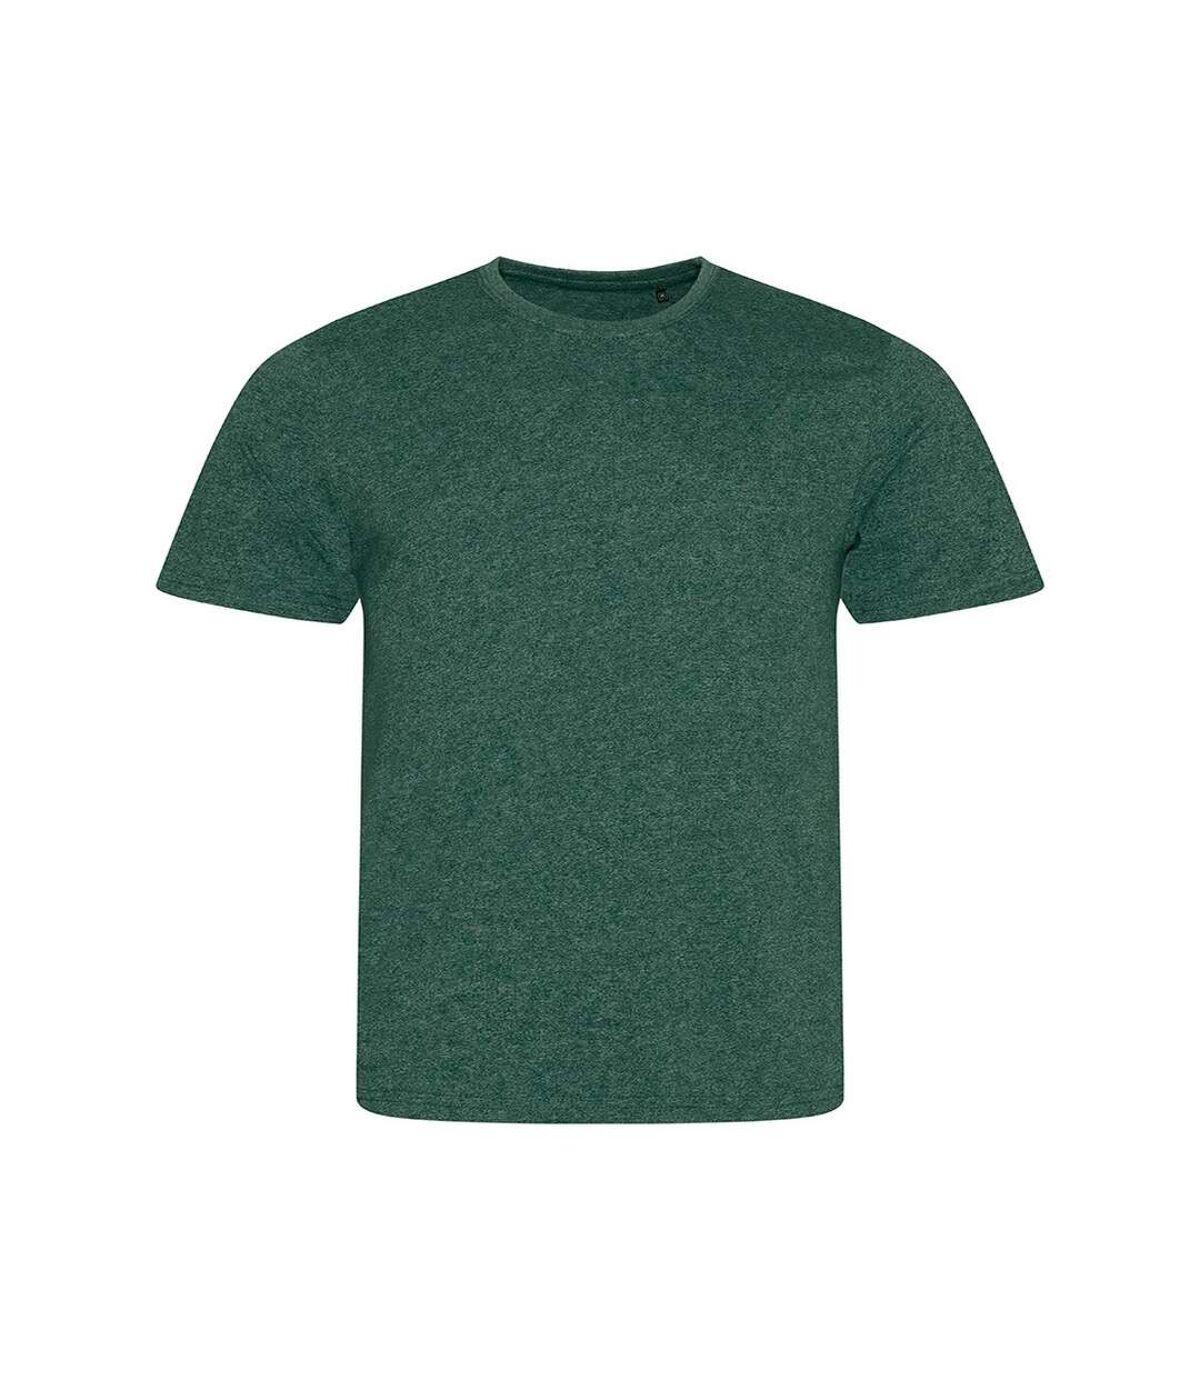 AWDis Mens Space Blend T Shirt (Space Green/White) - UTPC2897